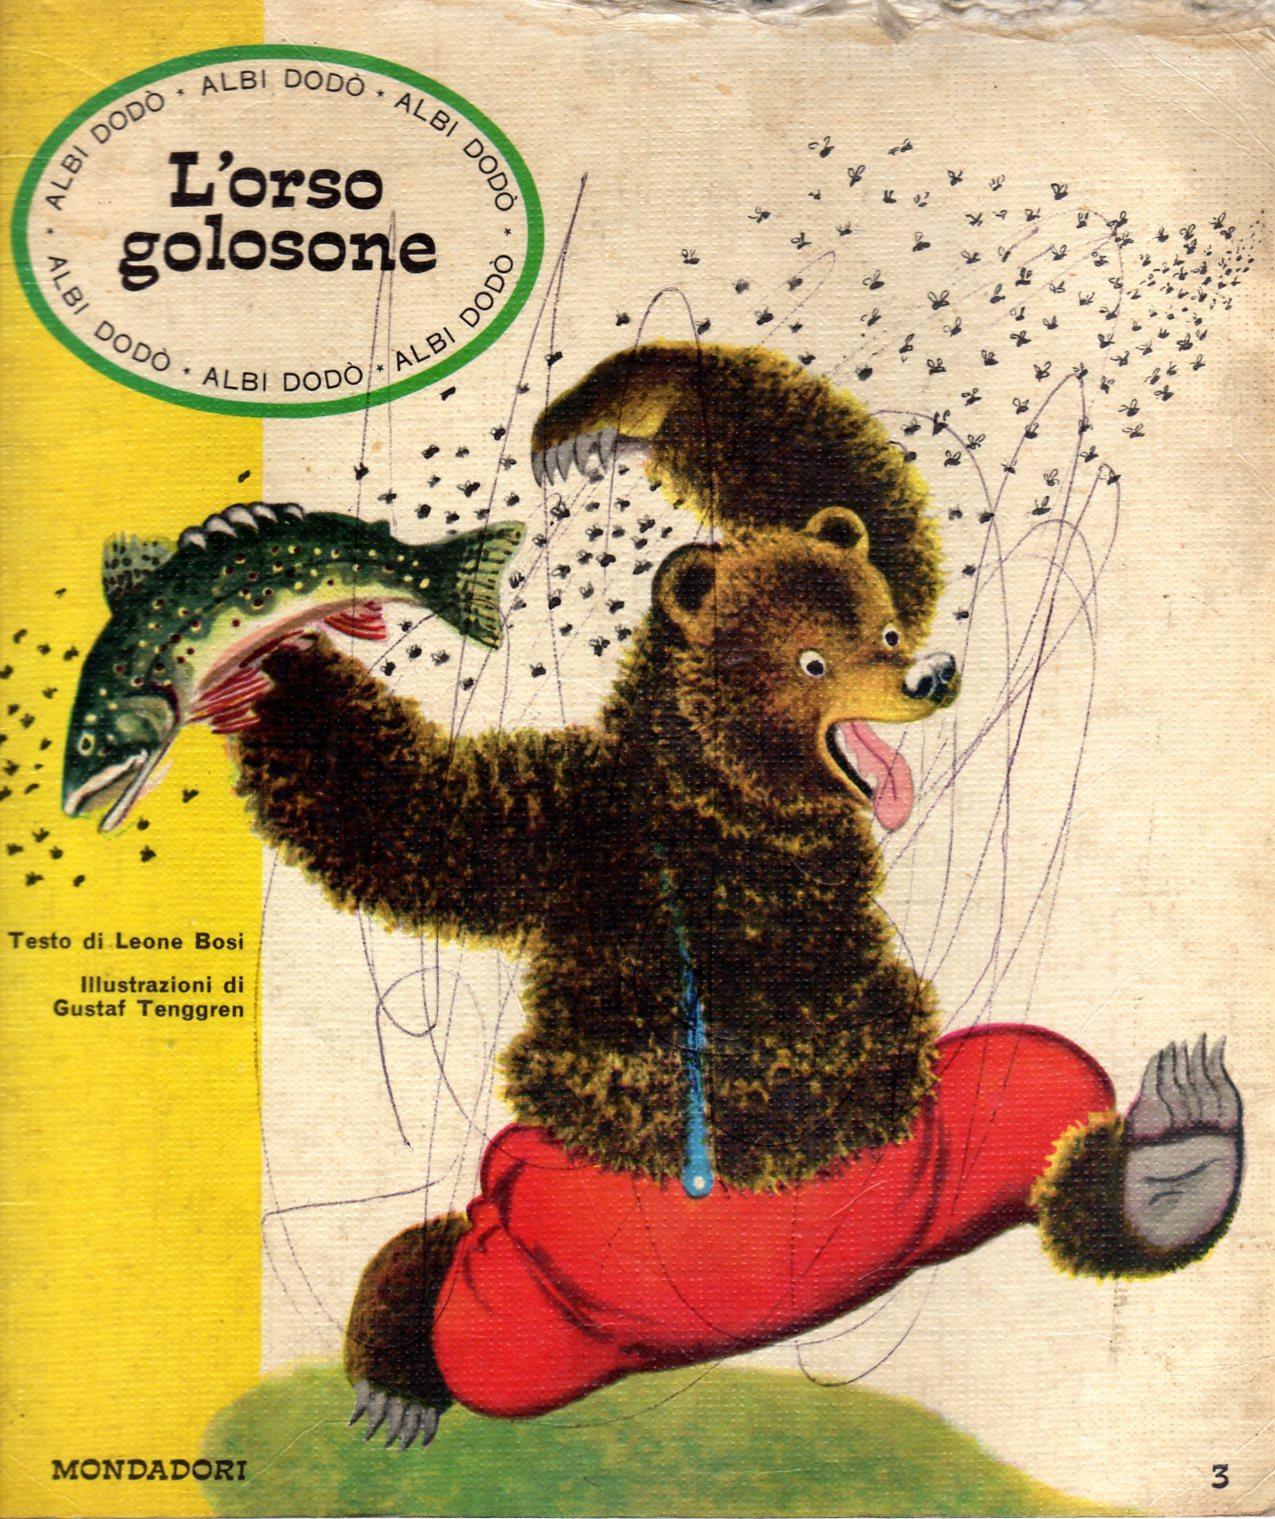 L'orso golosone